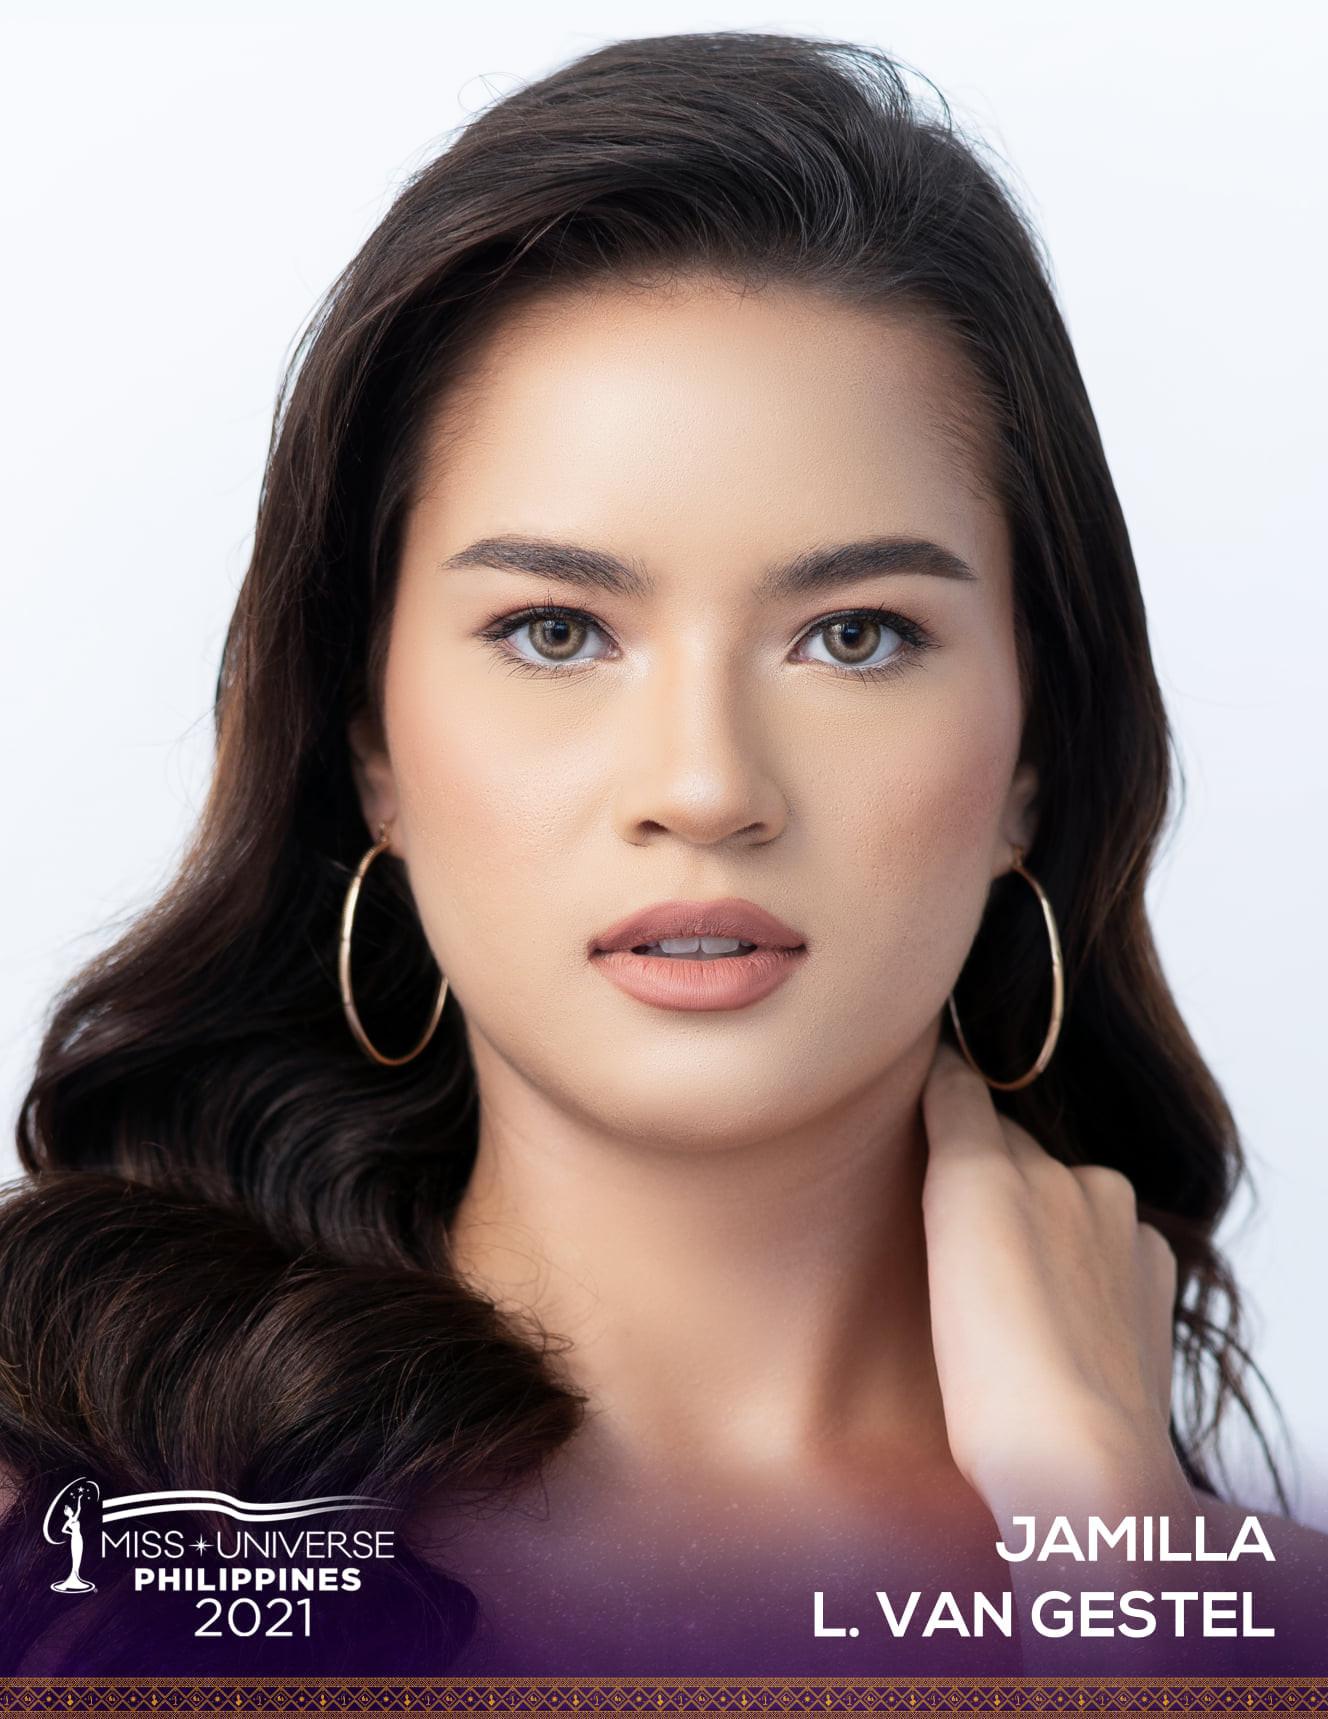 pre-candidatas a miss universe philippines 2021. - Página 5 Al7sQ2